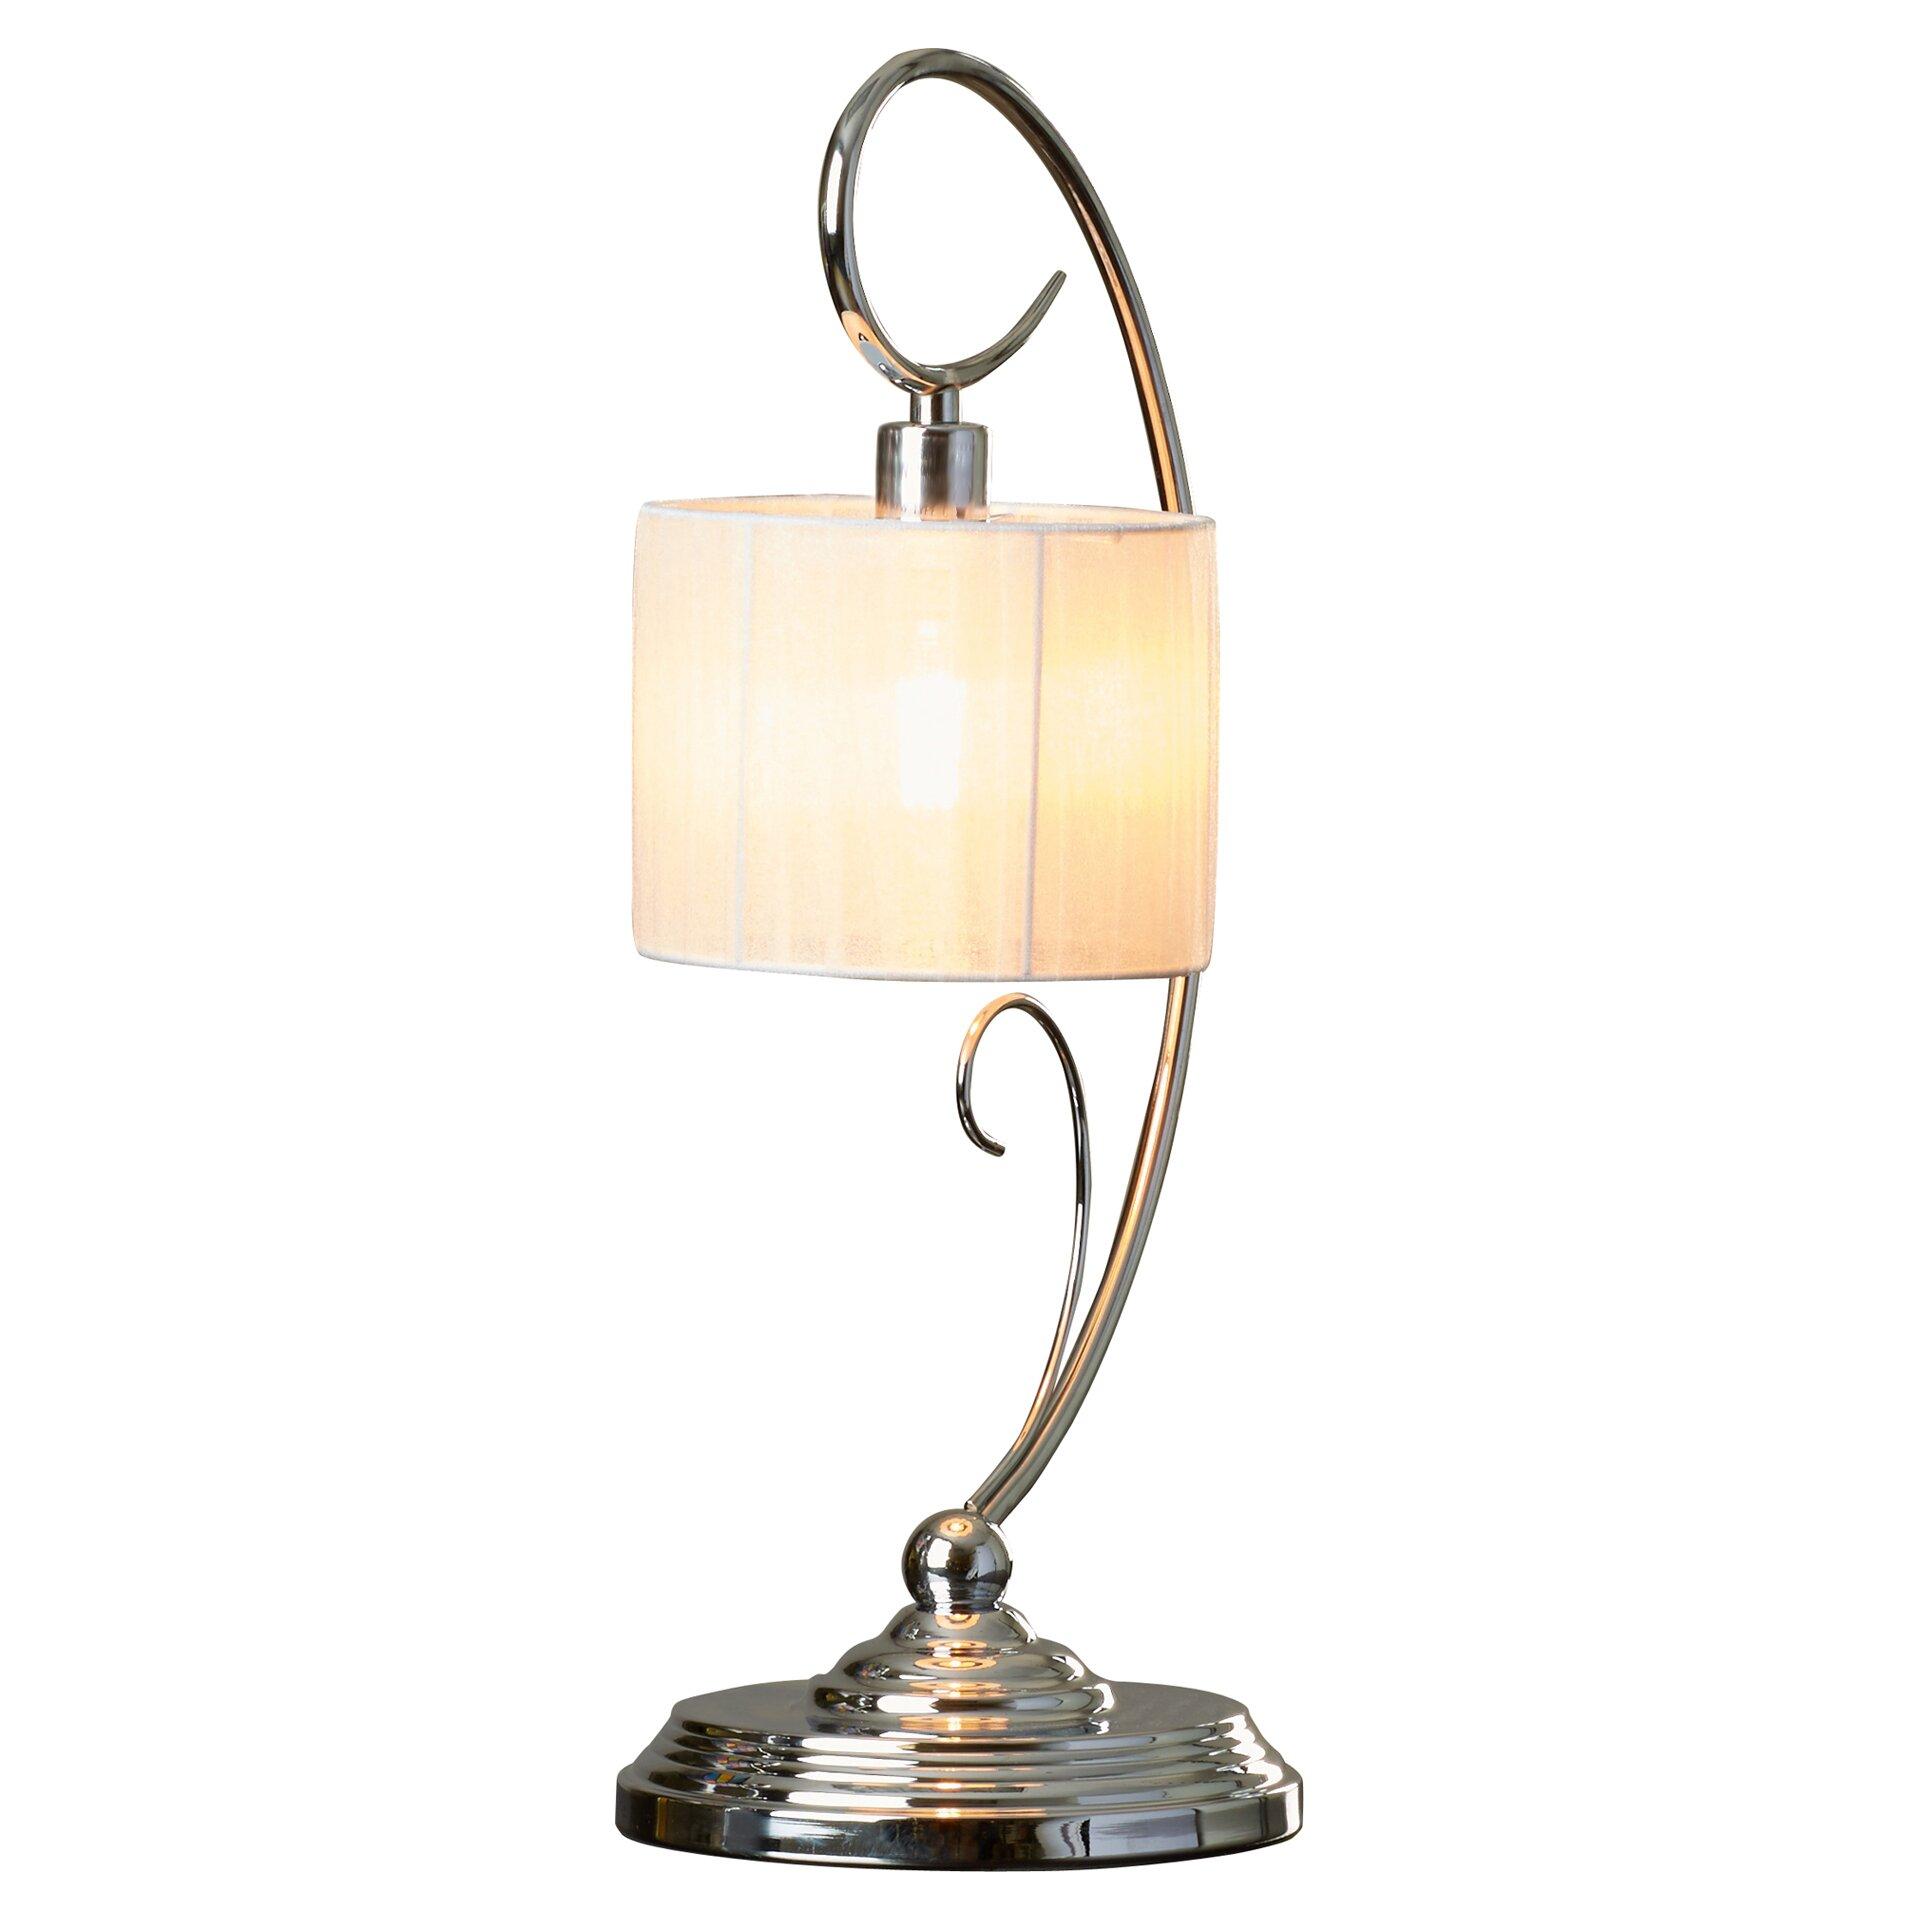 lighting lamps table lamps house of hampton sku hohn2066. Black Bedroom Furniture Sets. Home Design Ideas